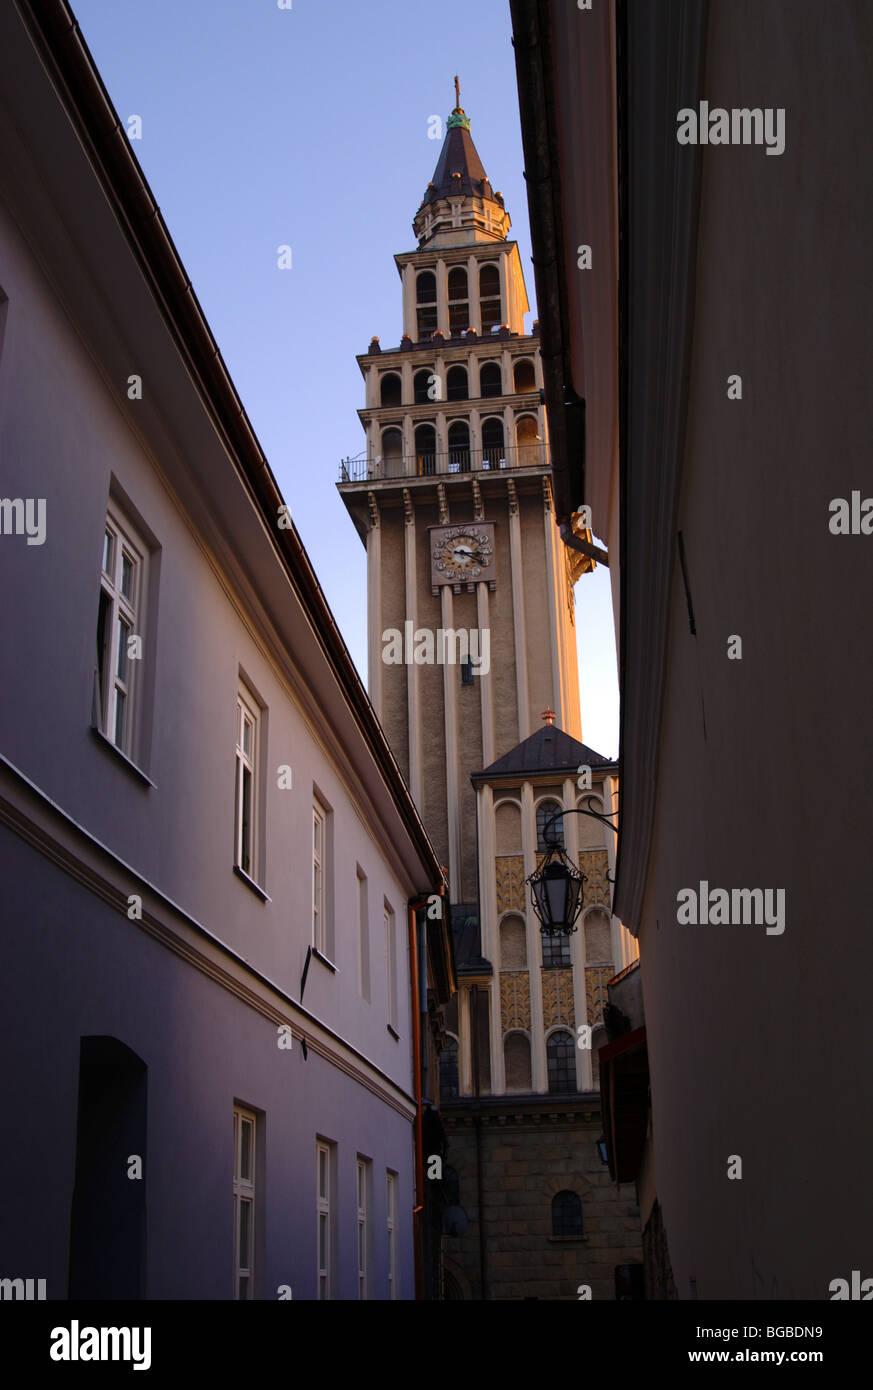 Bielsko Biala old town - Stock Image